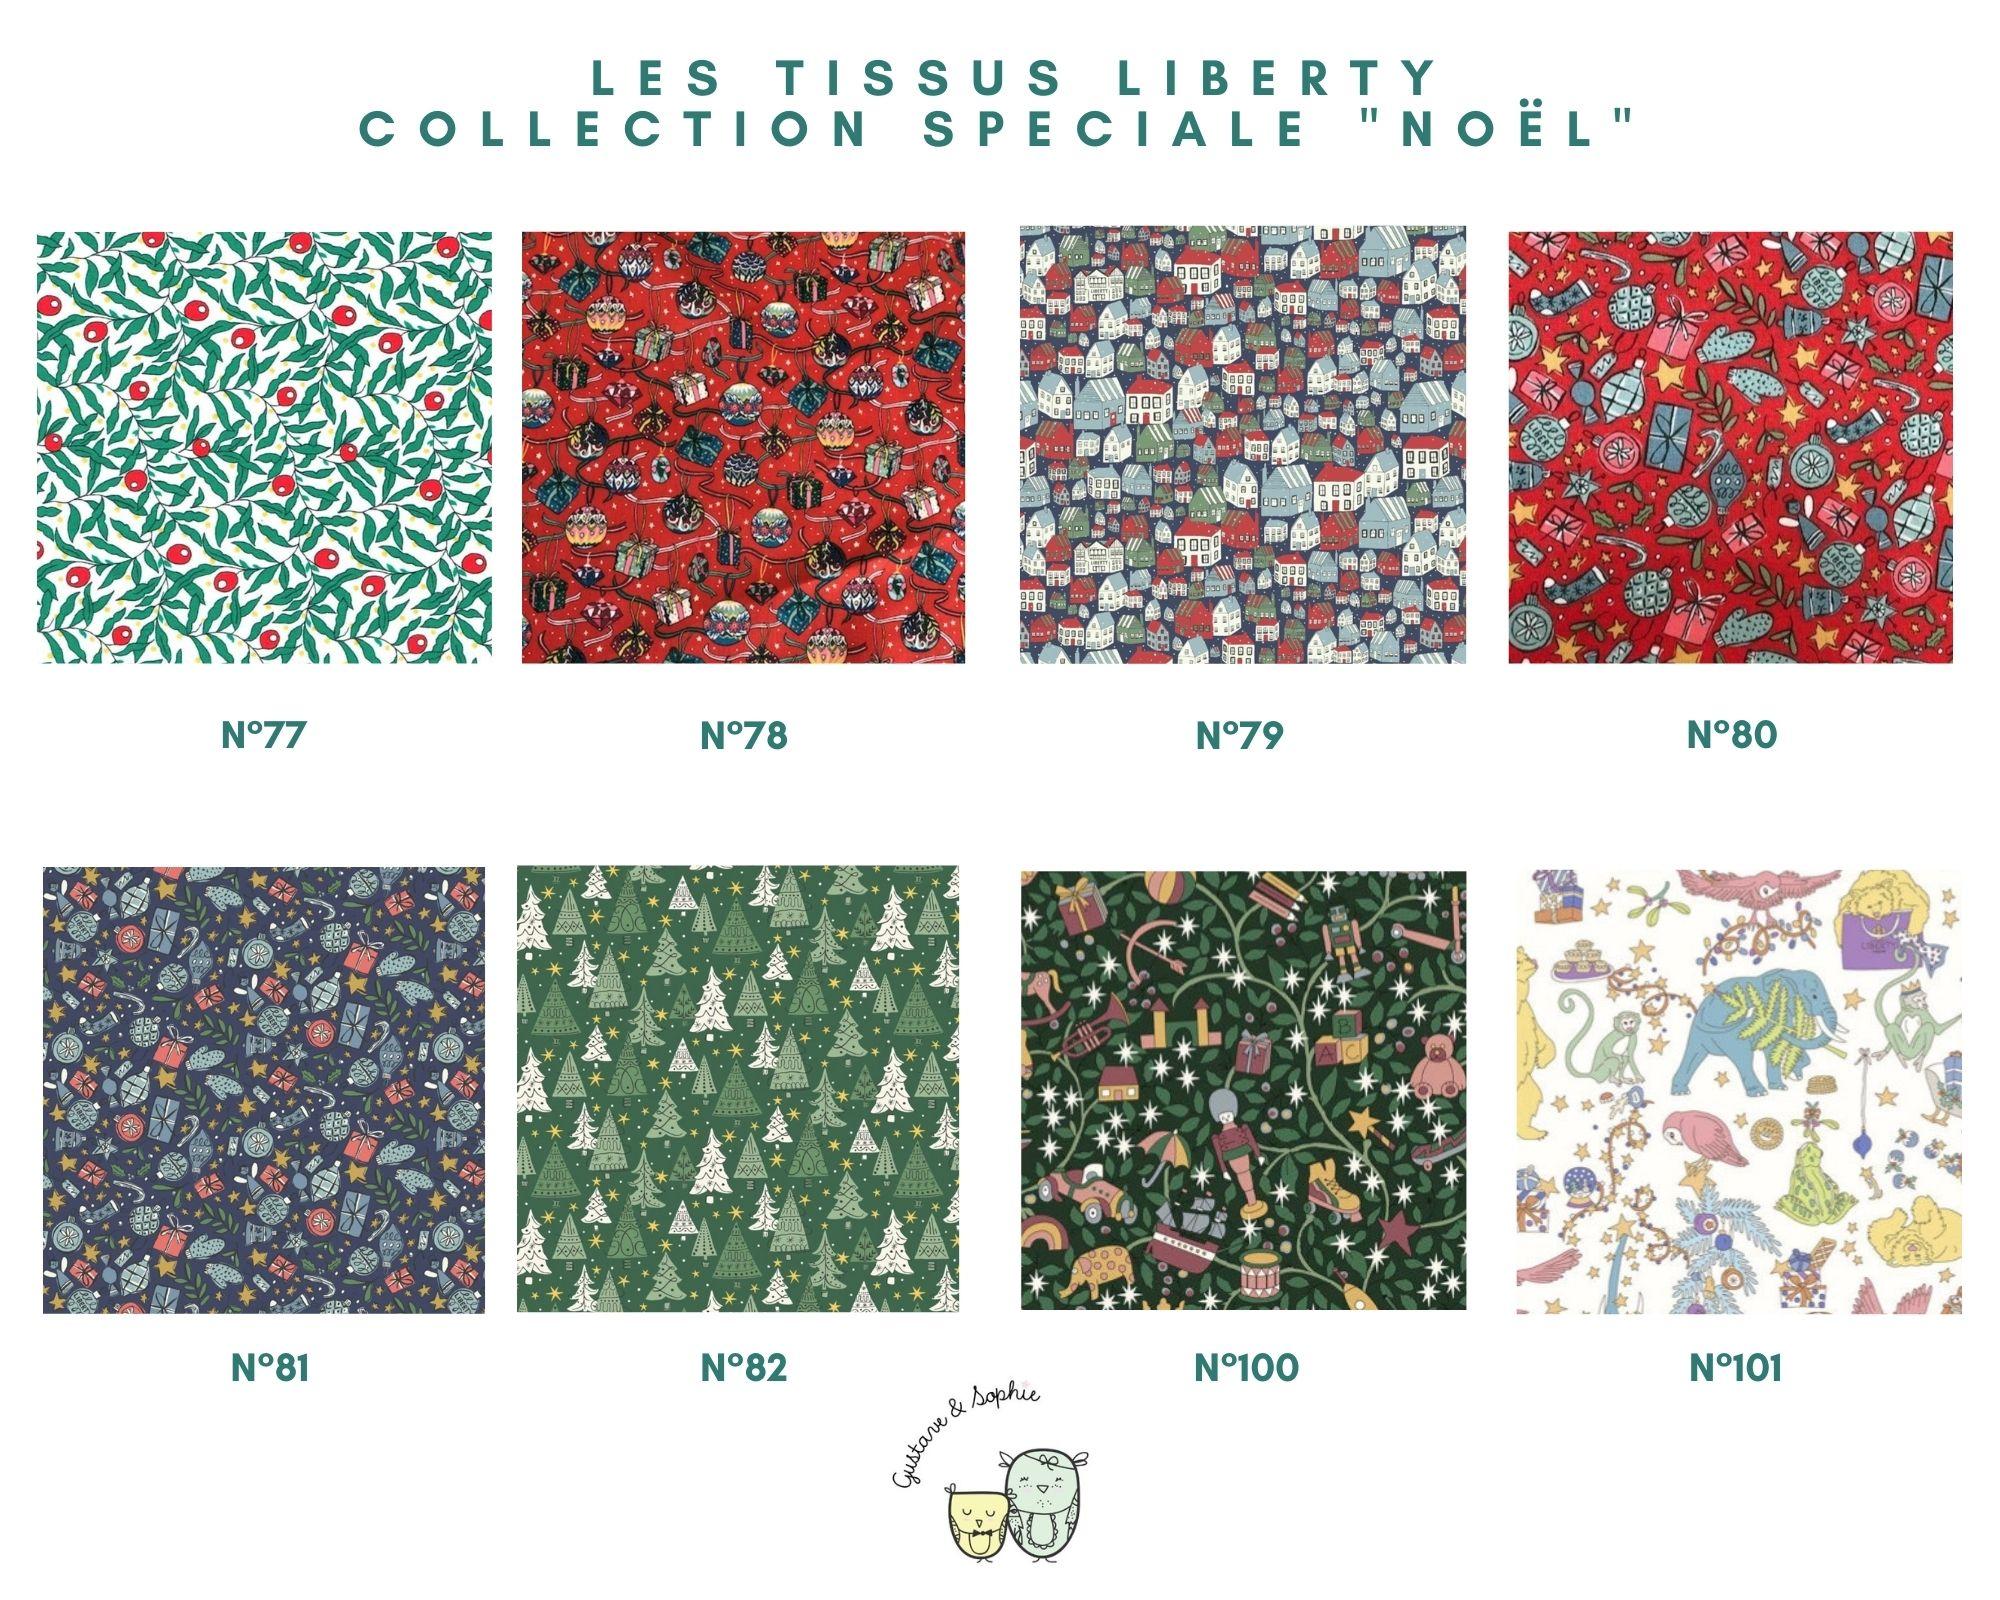 tissu-liberty-noel-lantana-tana-lawn-idee-cadeau-noel-creation-sur-mesure-personnalisee-gustavesophie